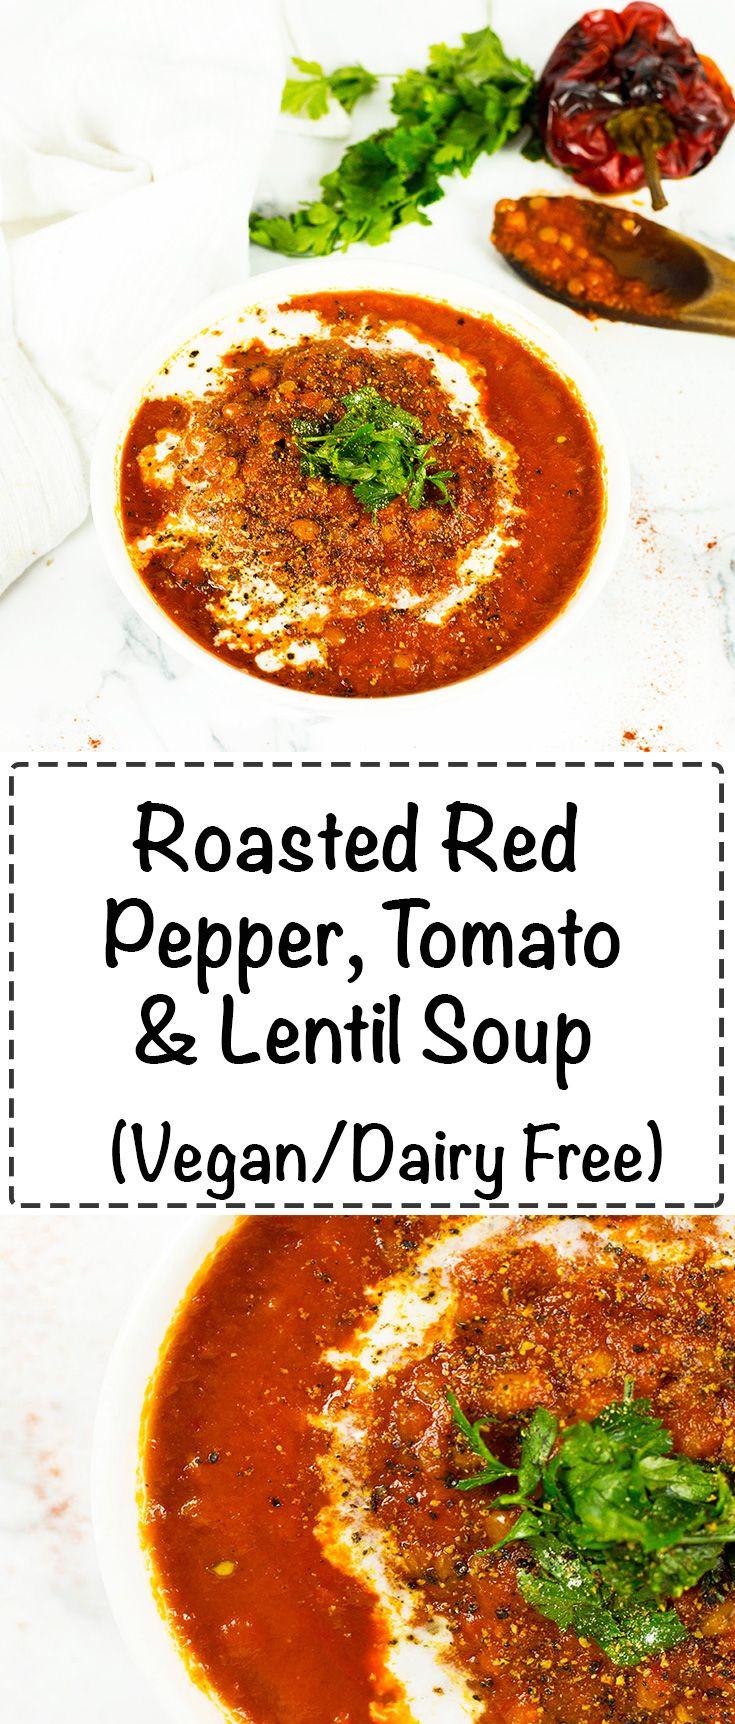 Roasted Red Pepper, Tomato and Lentil Soup - A nourishing, tasty and hearty vegan soup. #vegan #glutenfreevegan     #soup #dairyfreesoup #tomatosoup #lentilsoup #vegansoup #vegandinner #lentils #tomatoes #glutenfree #glutenfreedinner